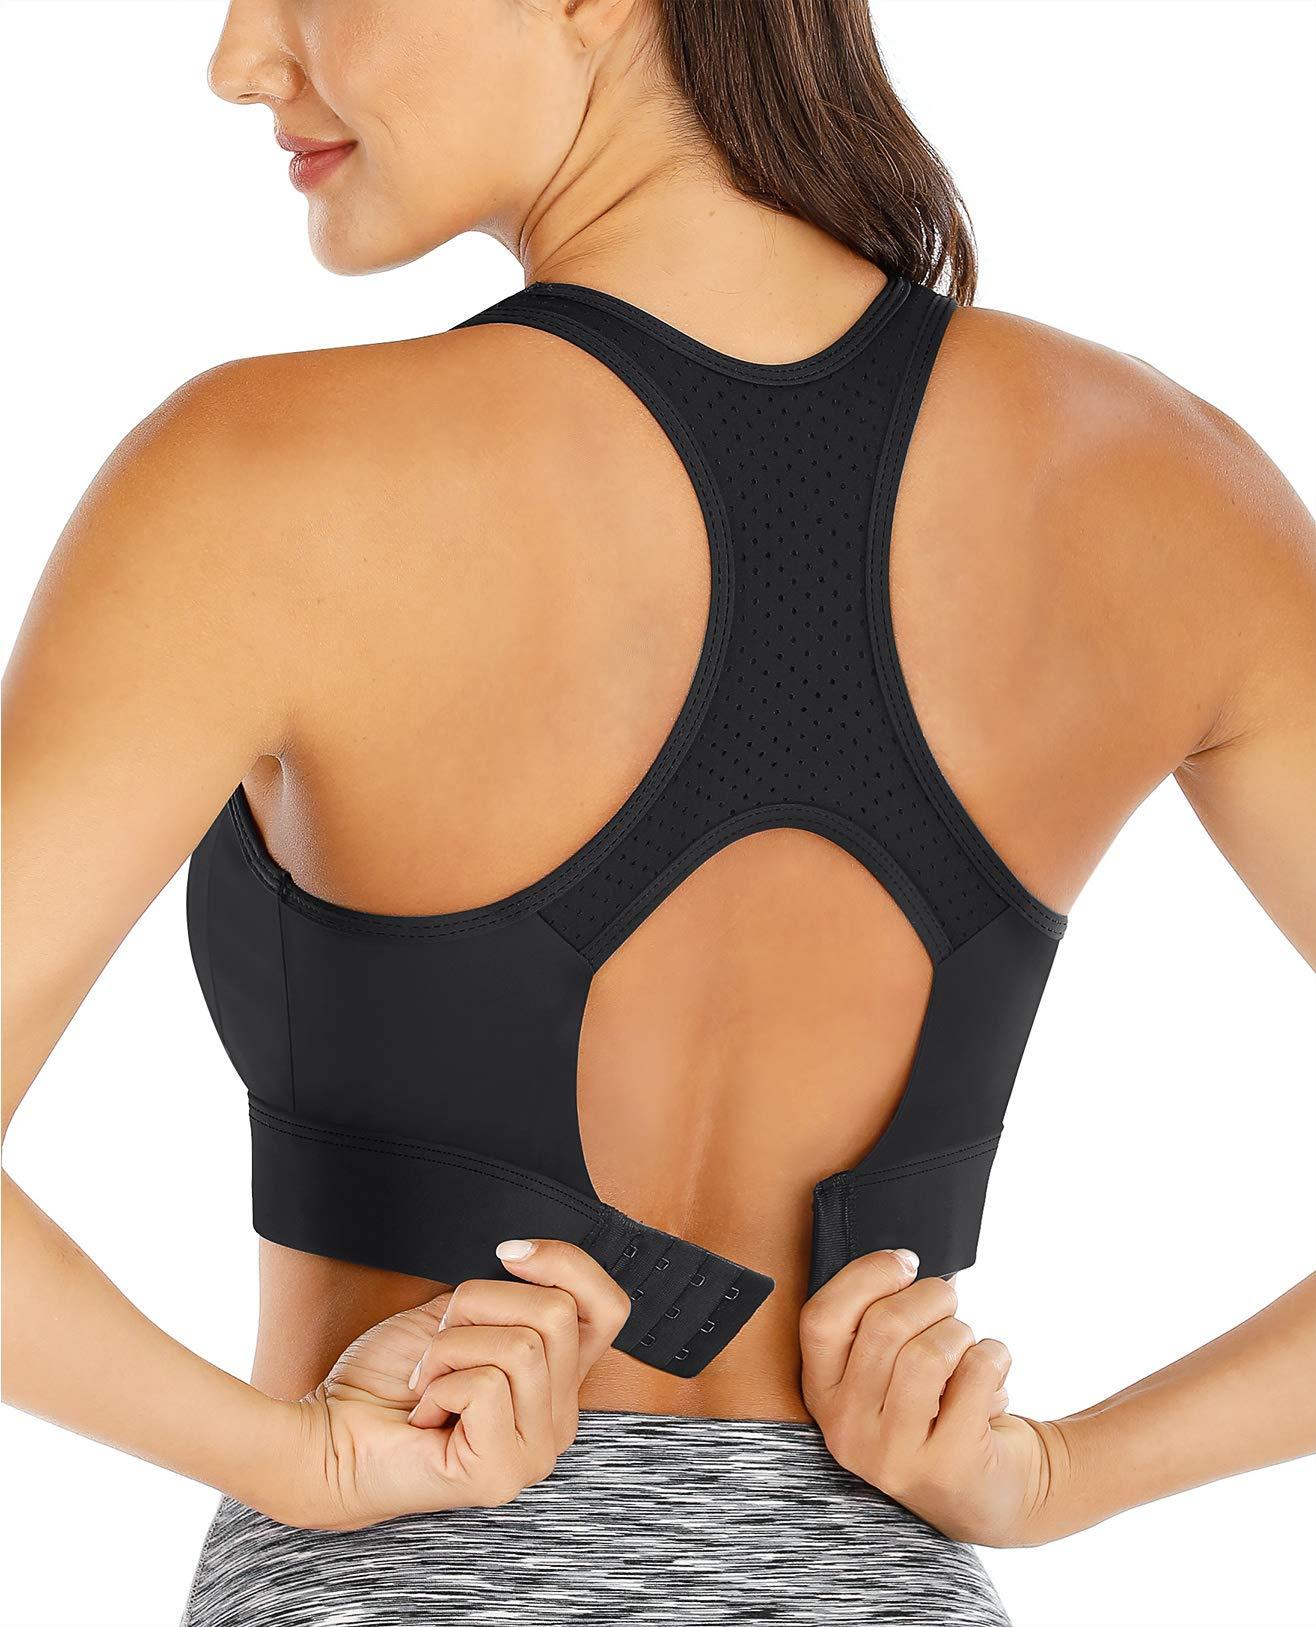 Bdcoco Womens Workout Medium Support Padded Sports Bra Wire-Free Running Shirts YogaTank Top